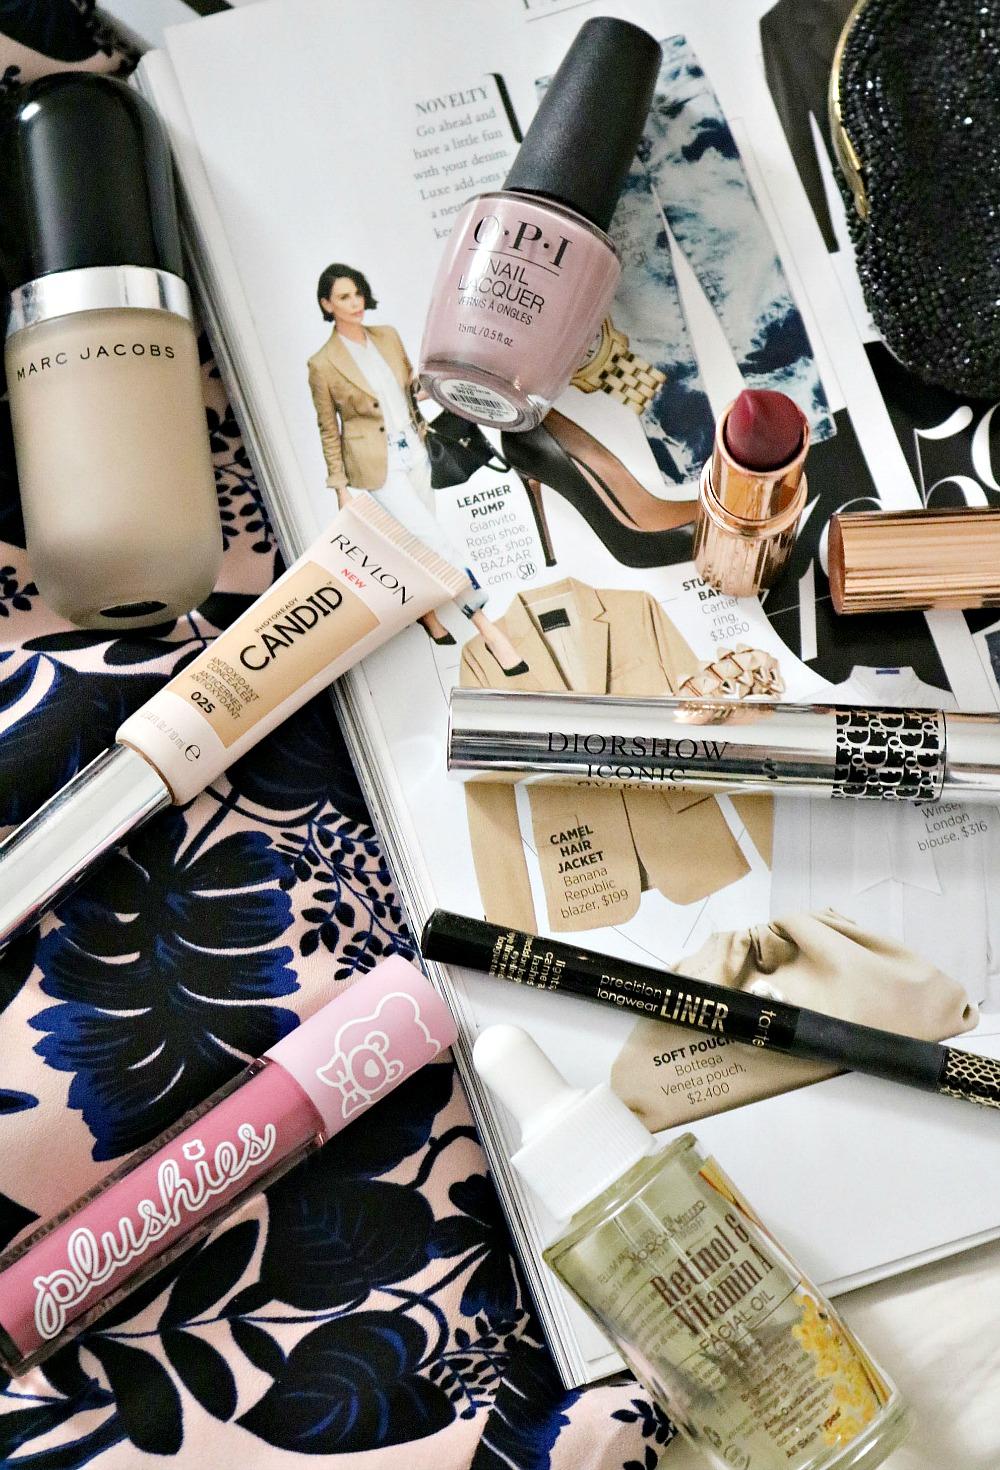 Early Fall Beauty Favorites I Lime Crime Plushies Liquid Lipstick in Lavendar Honey #Makeup #Fallmakeup #beautyblog